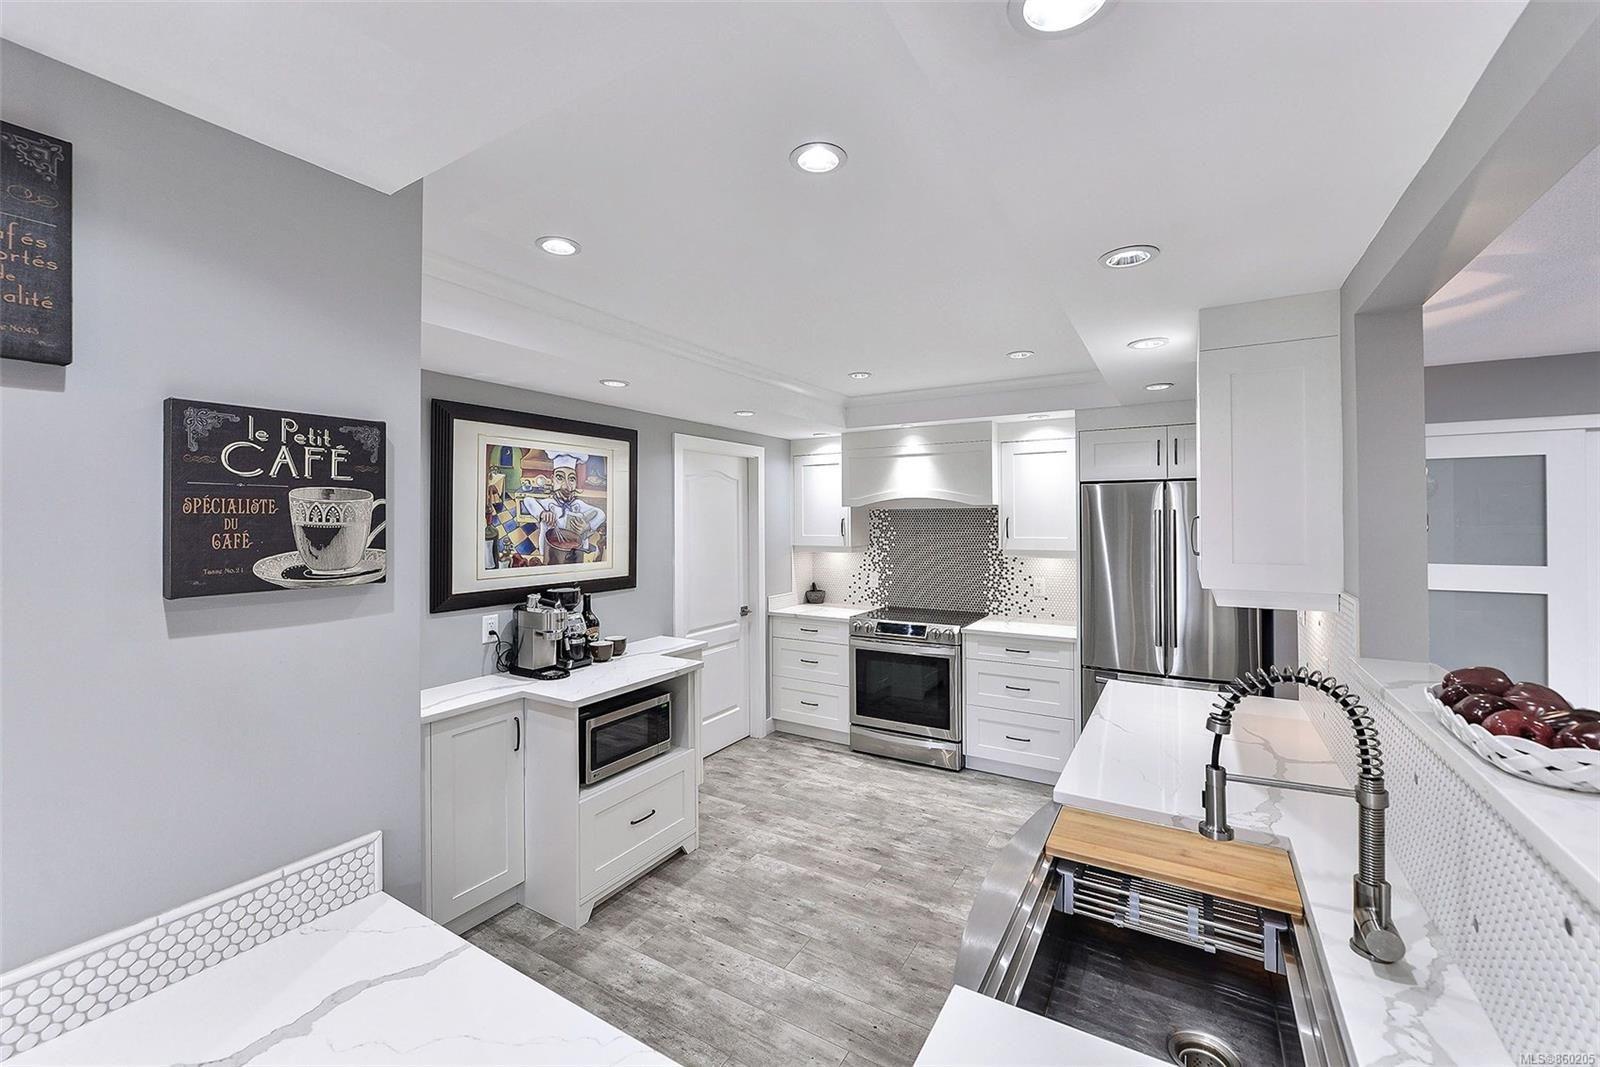 Photo 12: Photos: 204 630 Montreal St in : Vi James Bay Condo for sale (Victoria)  : MLS®# 860205